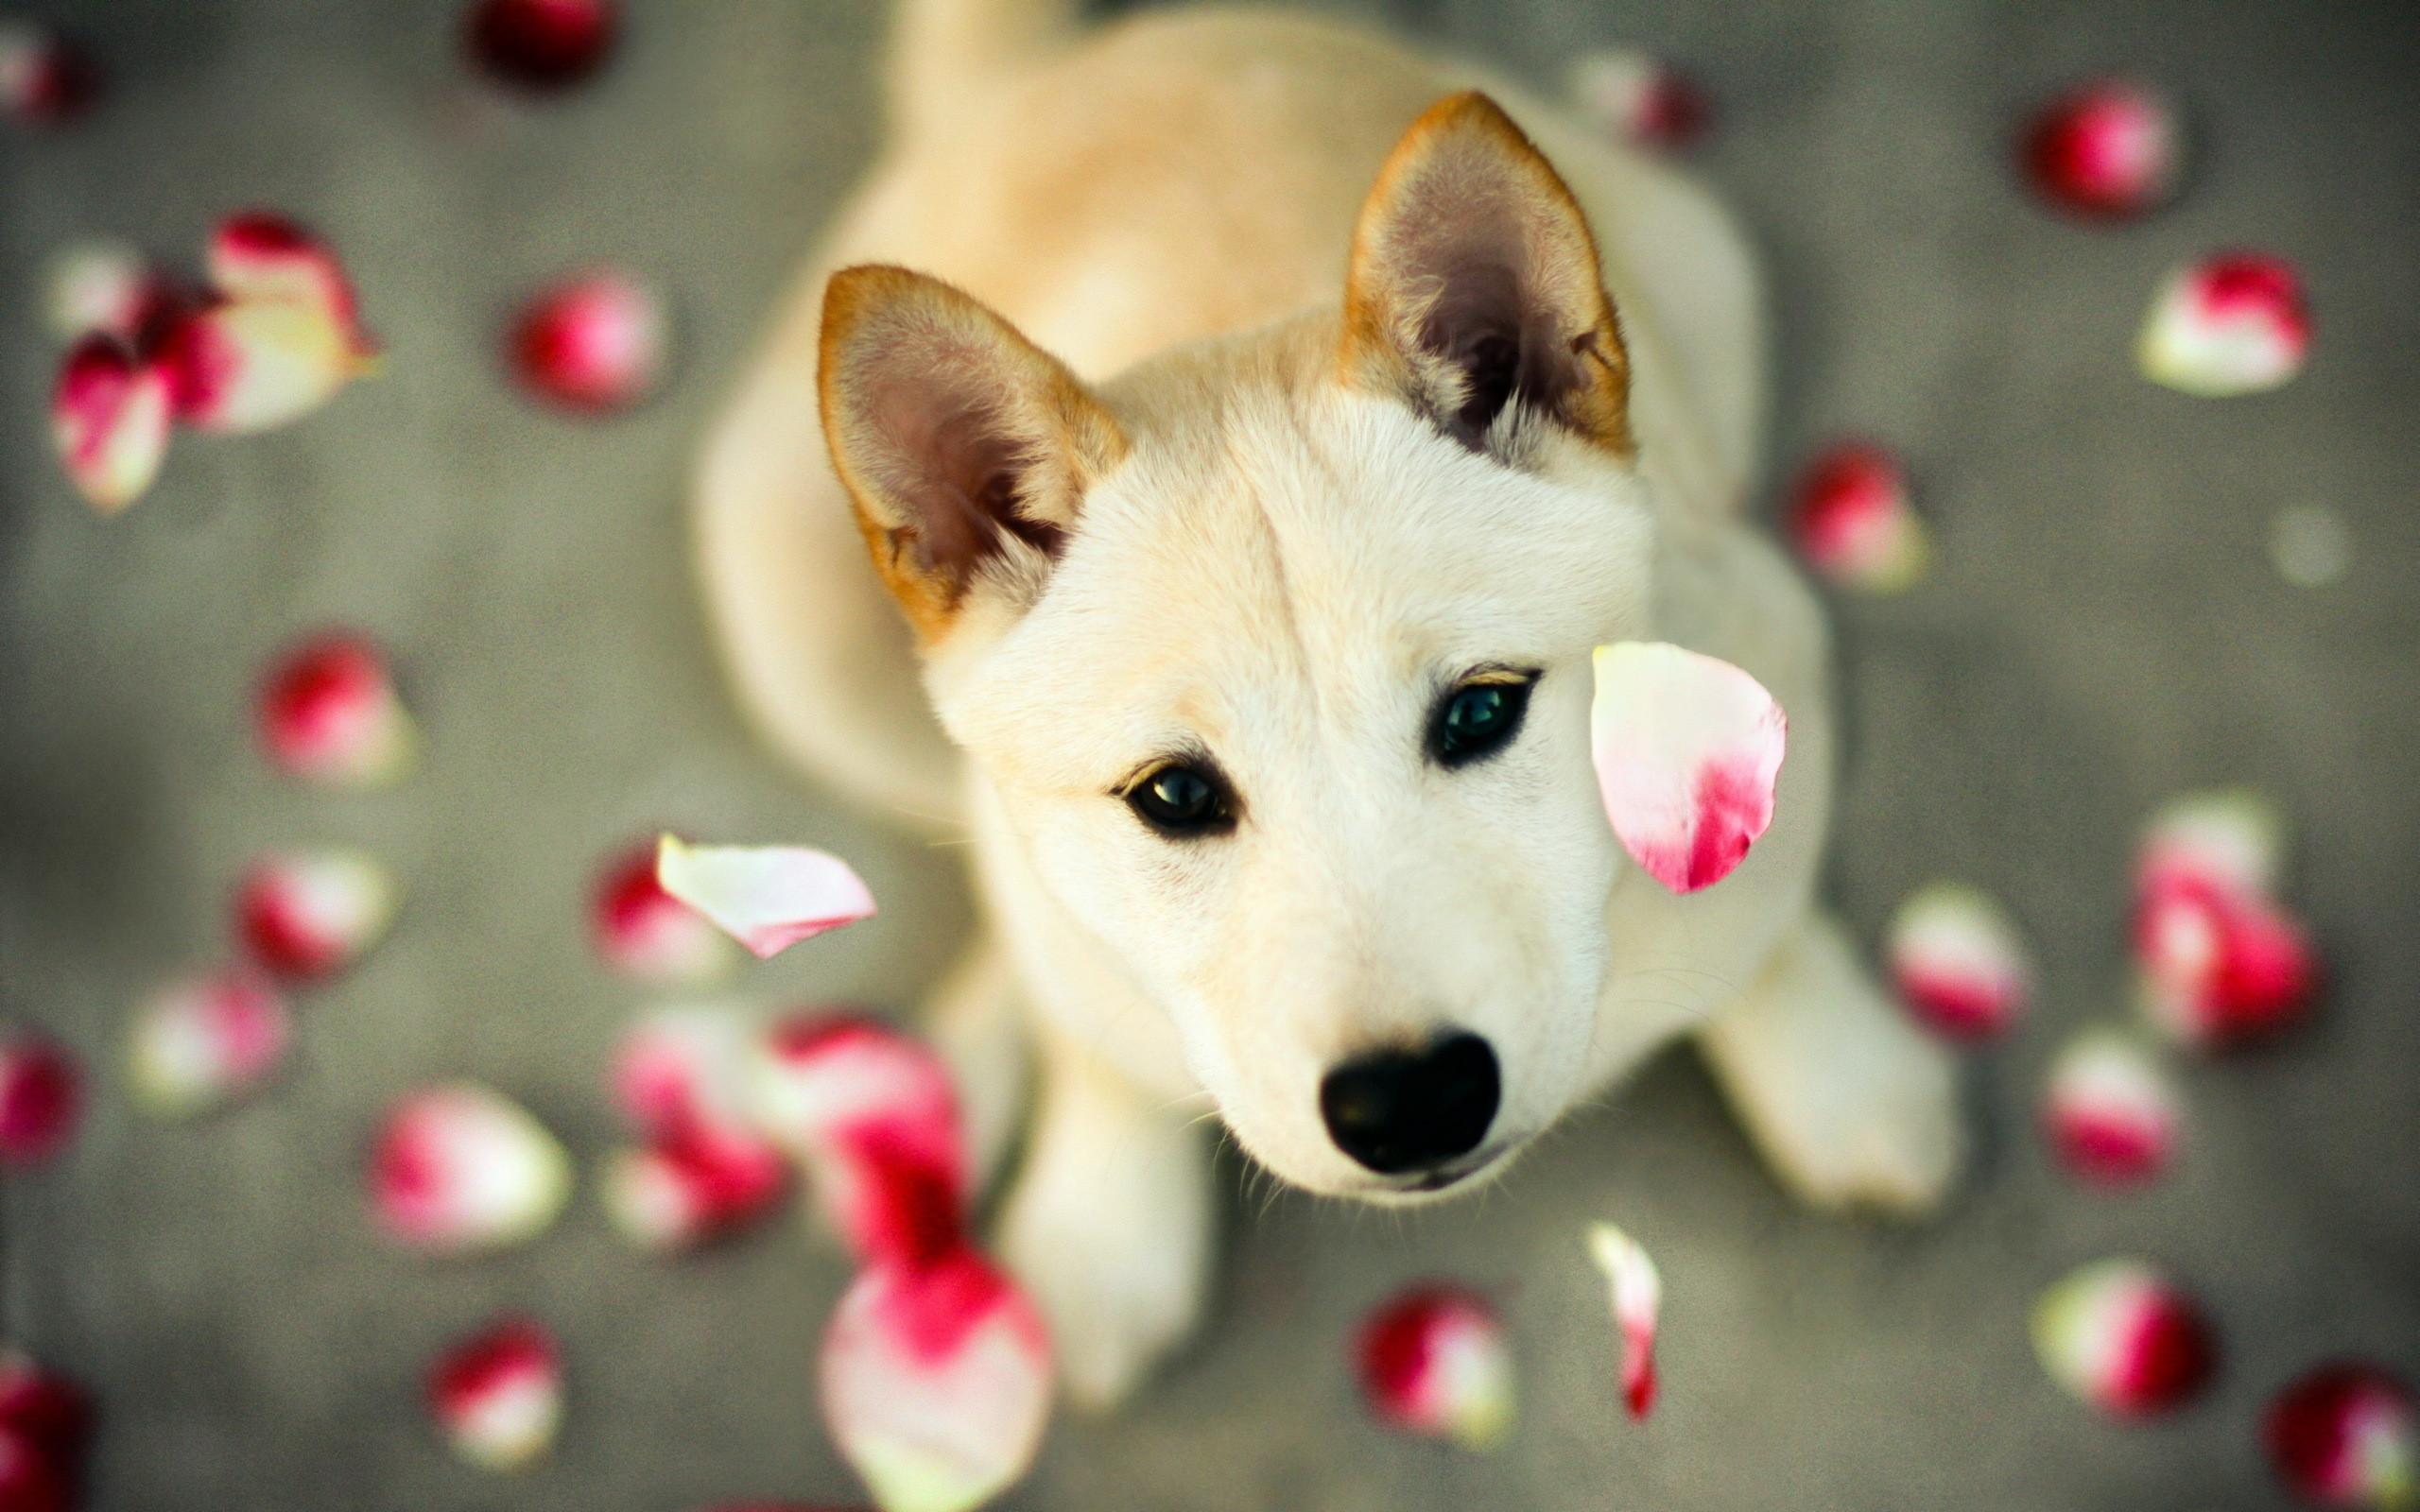 … cute animal wallpapers on kubipet com …